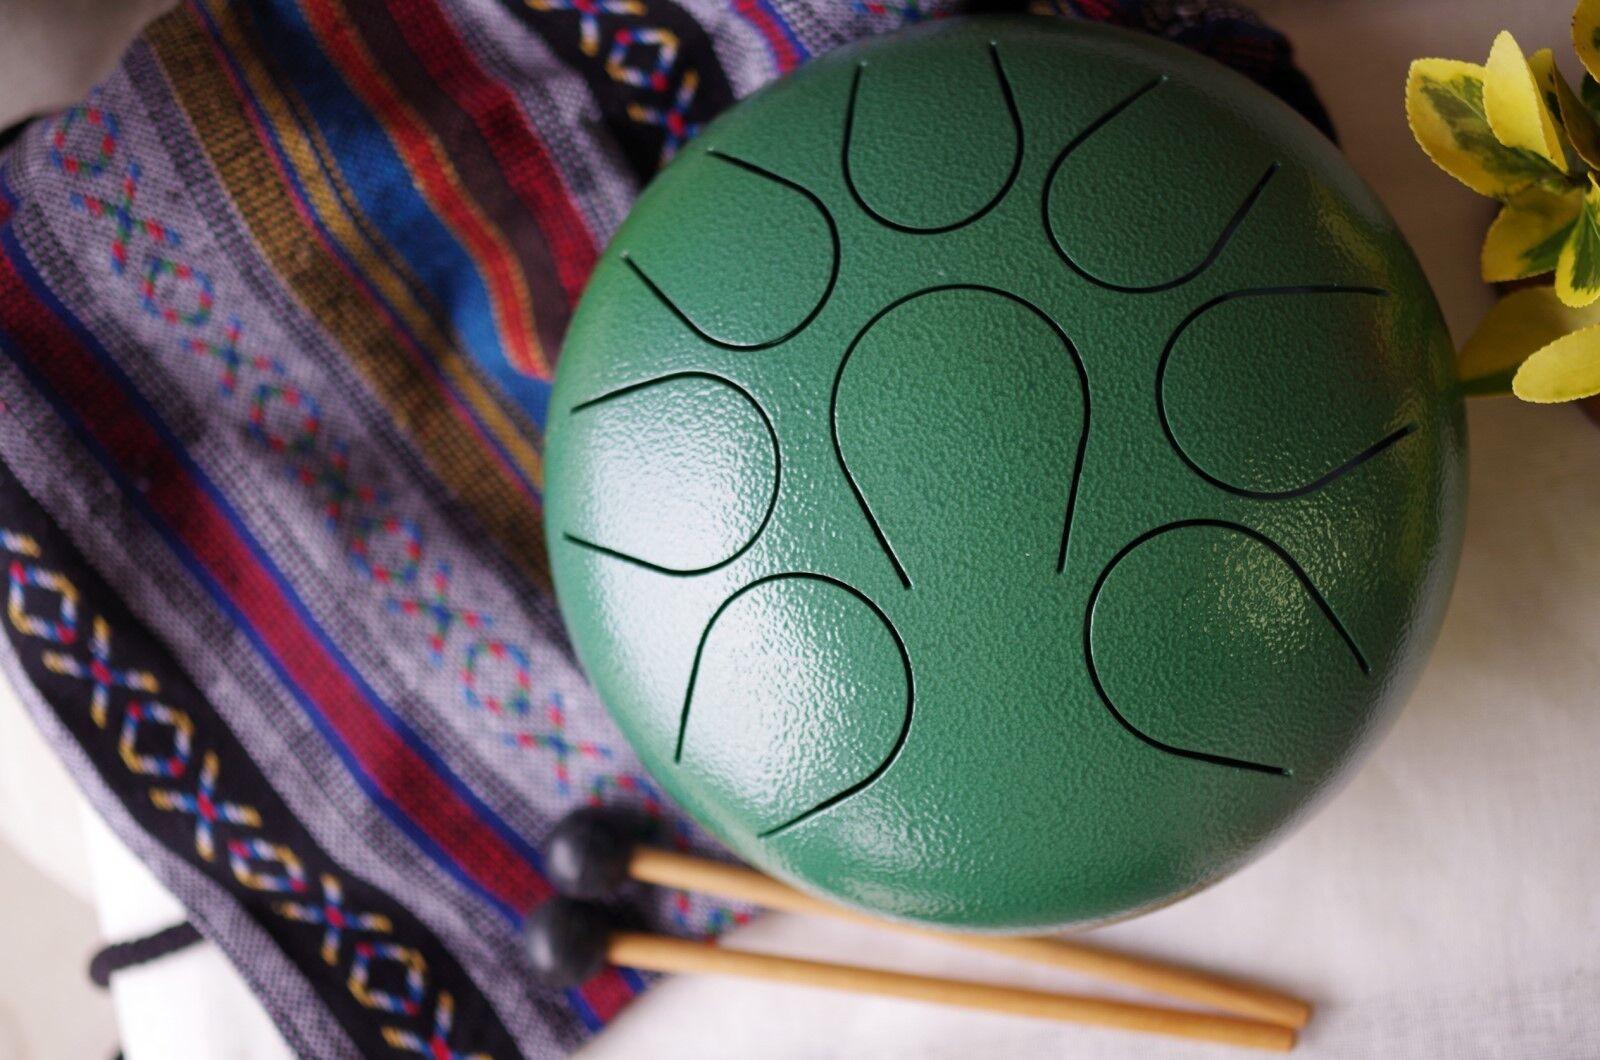 Hand Pan Drum Steel Tongue Drum Chakra drum WuYou 9in Great Christmas Gift Grün